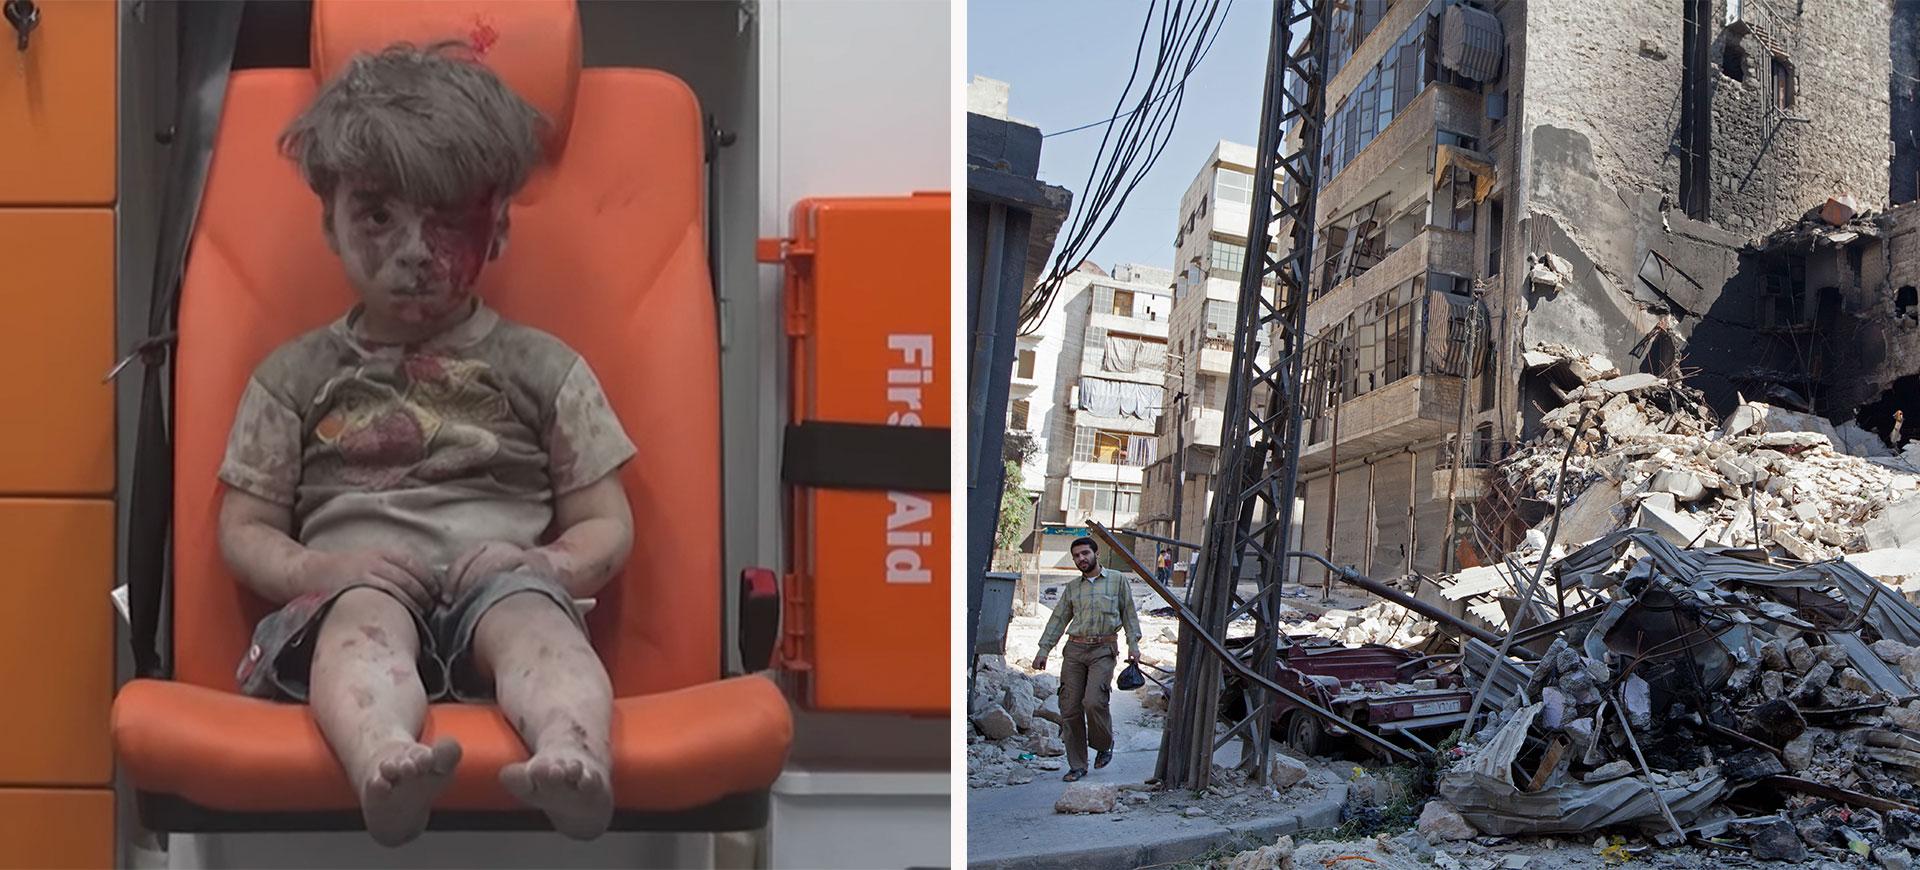 syrien pojke omran bombad